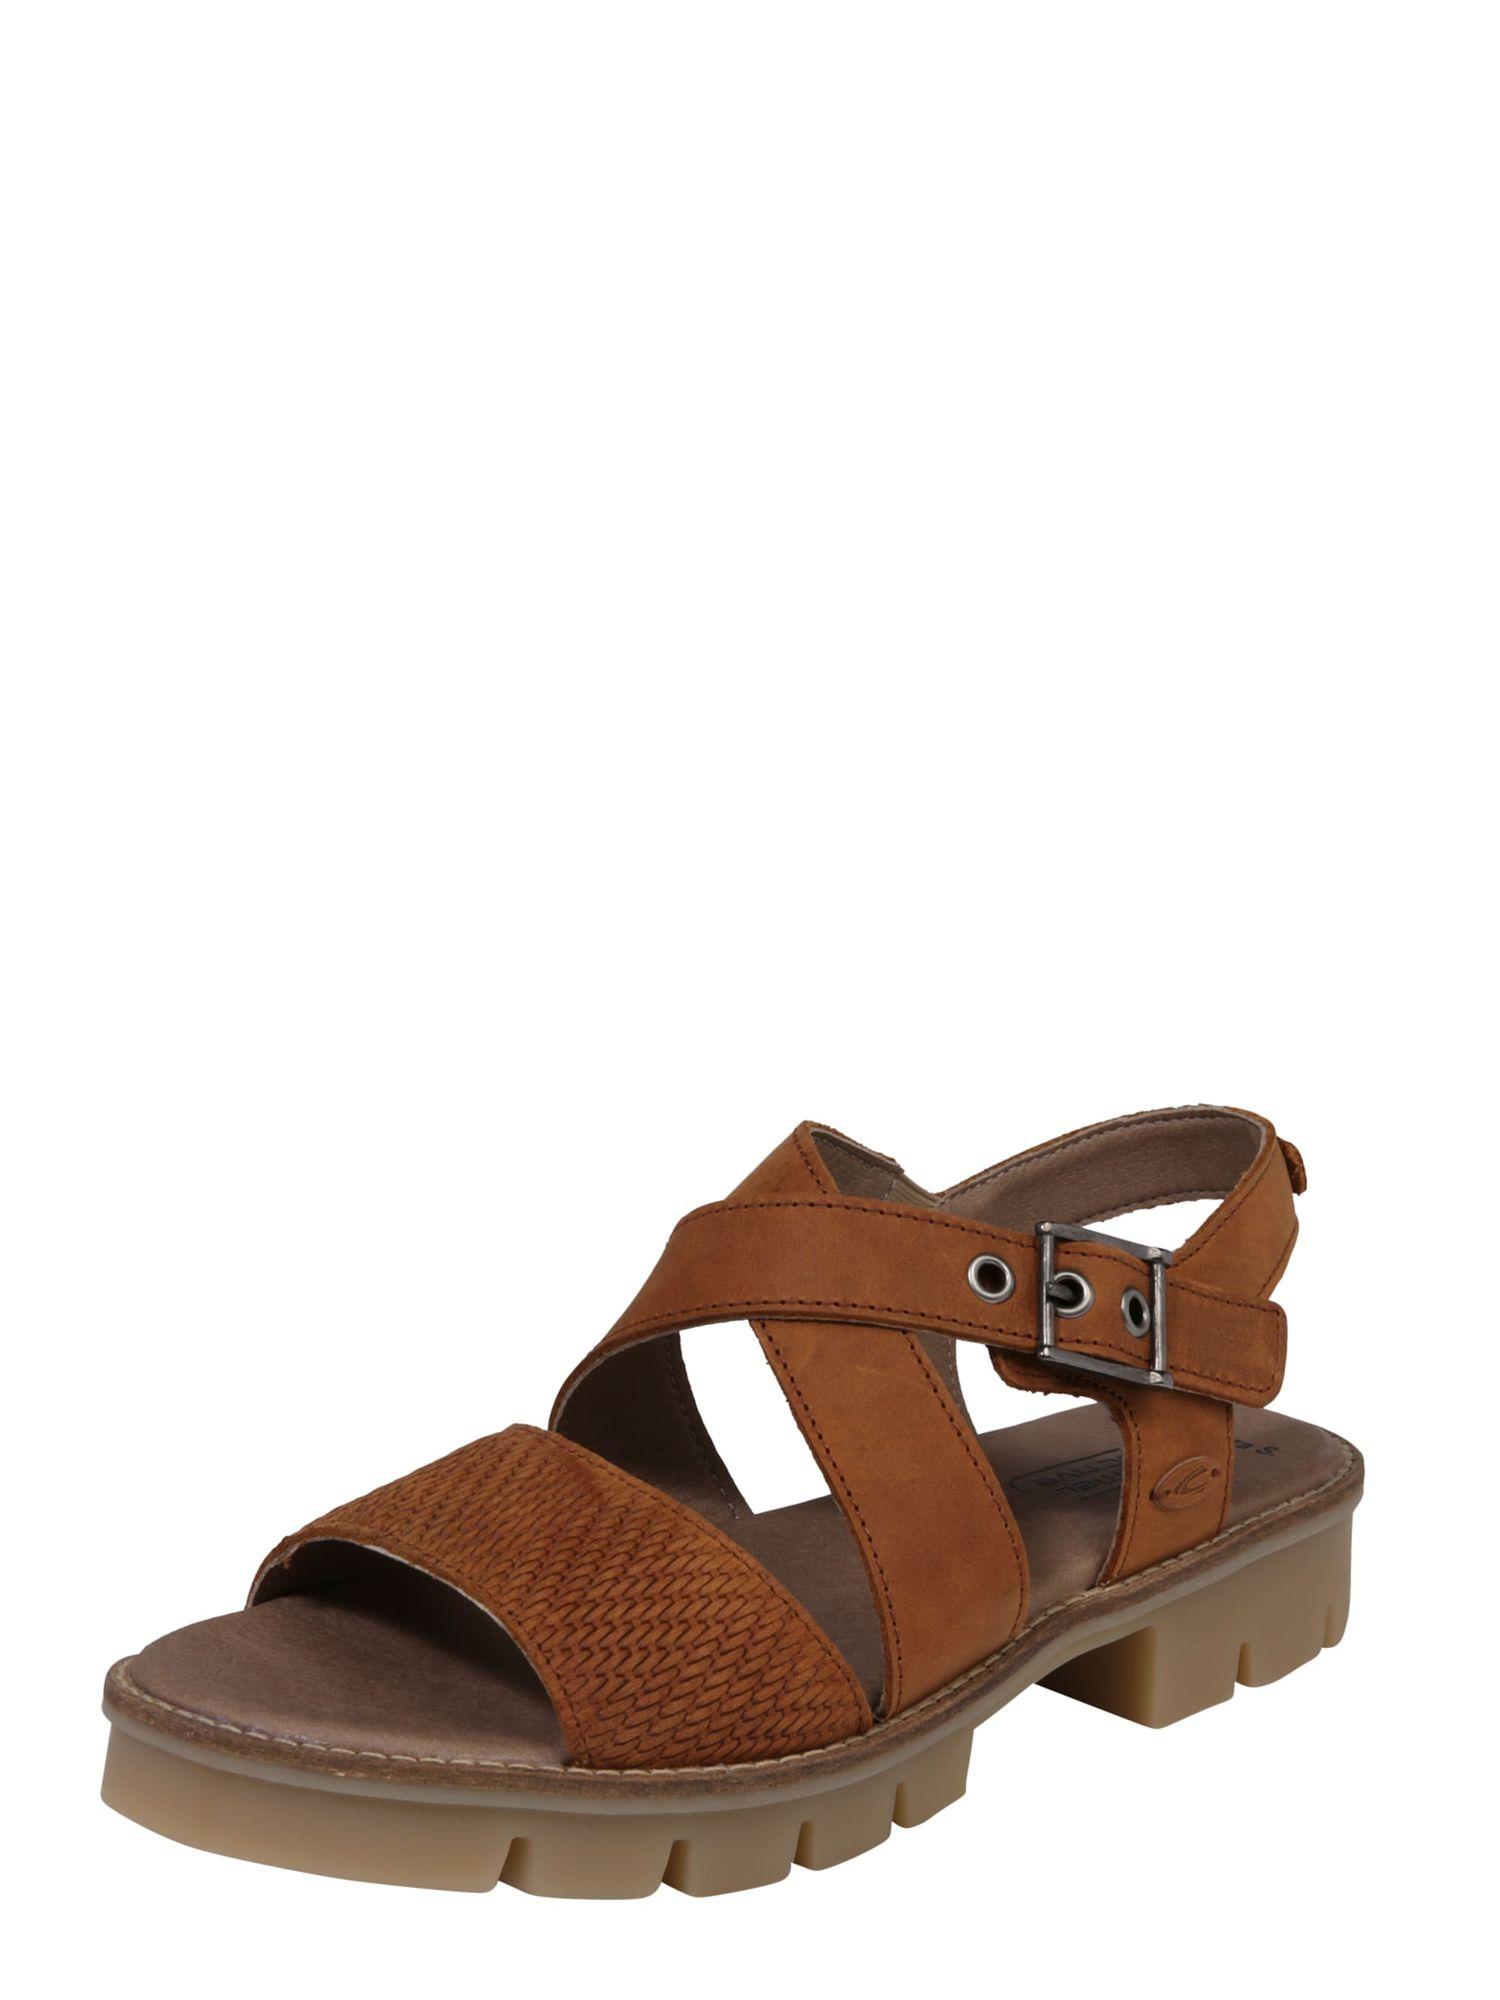 Sandale ´Canberra S. 71´